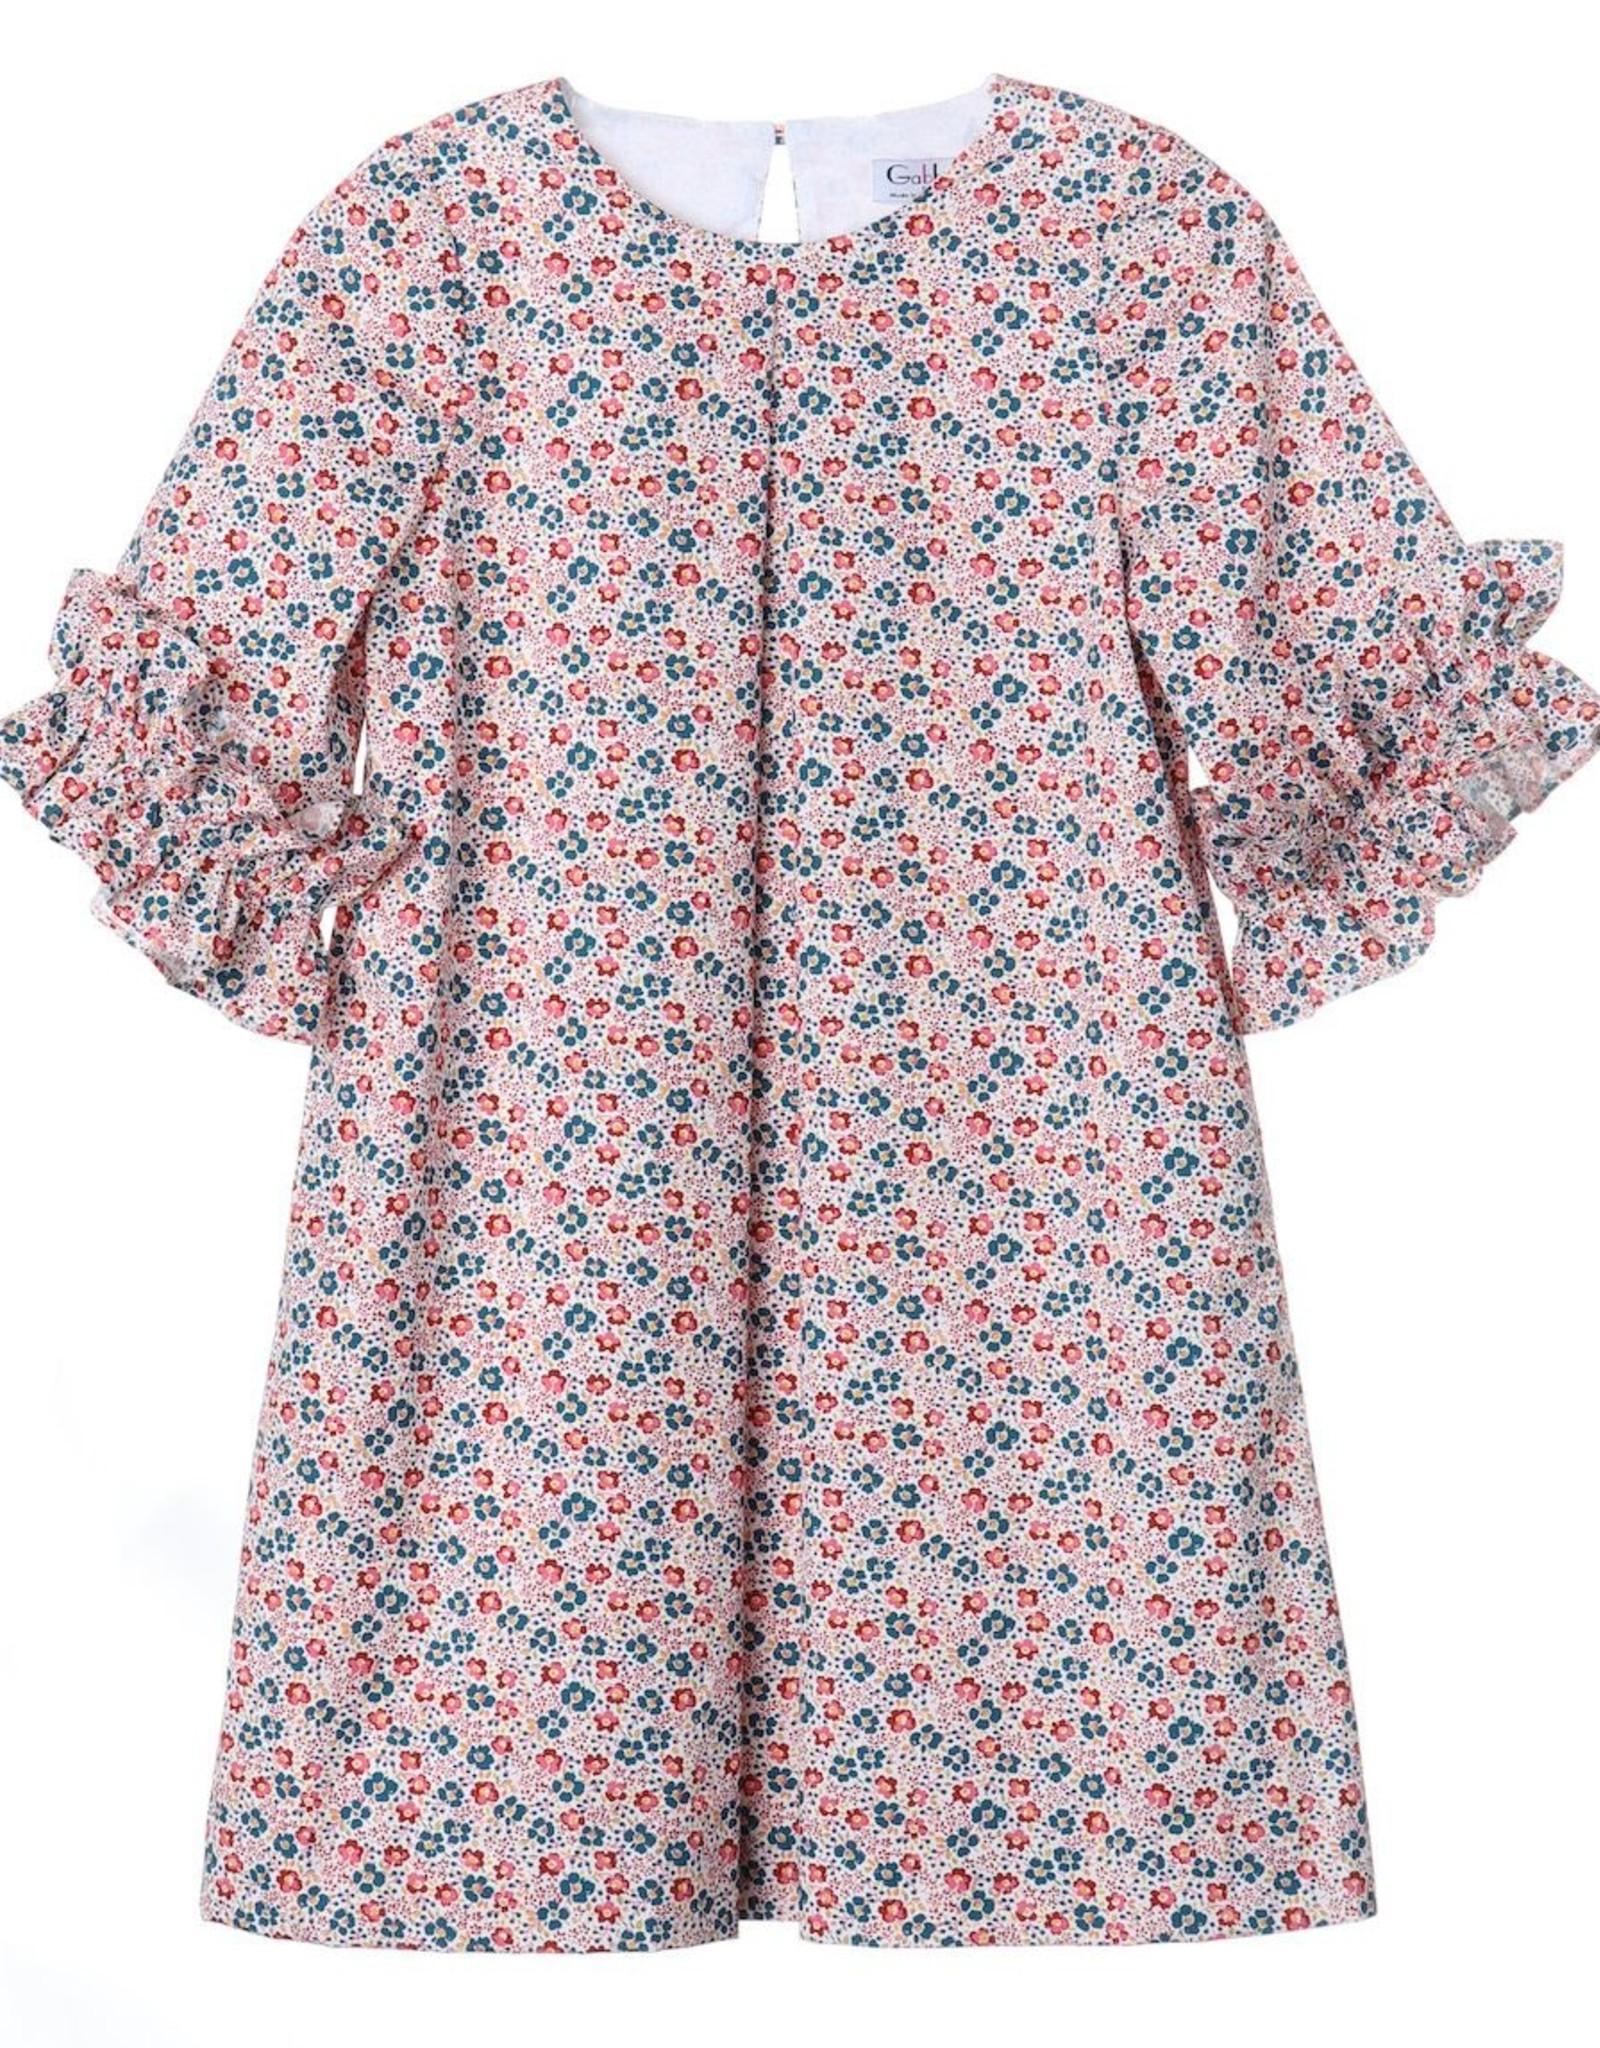 Lolly Shift Print Dress